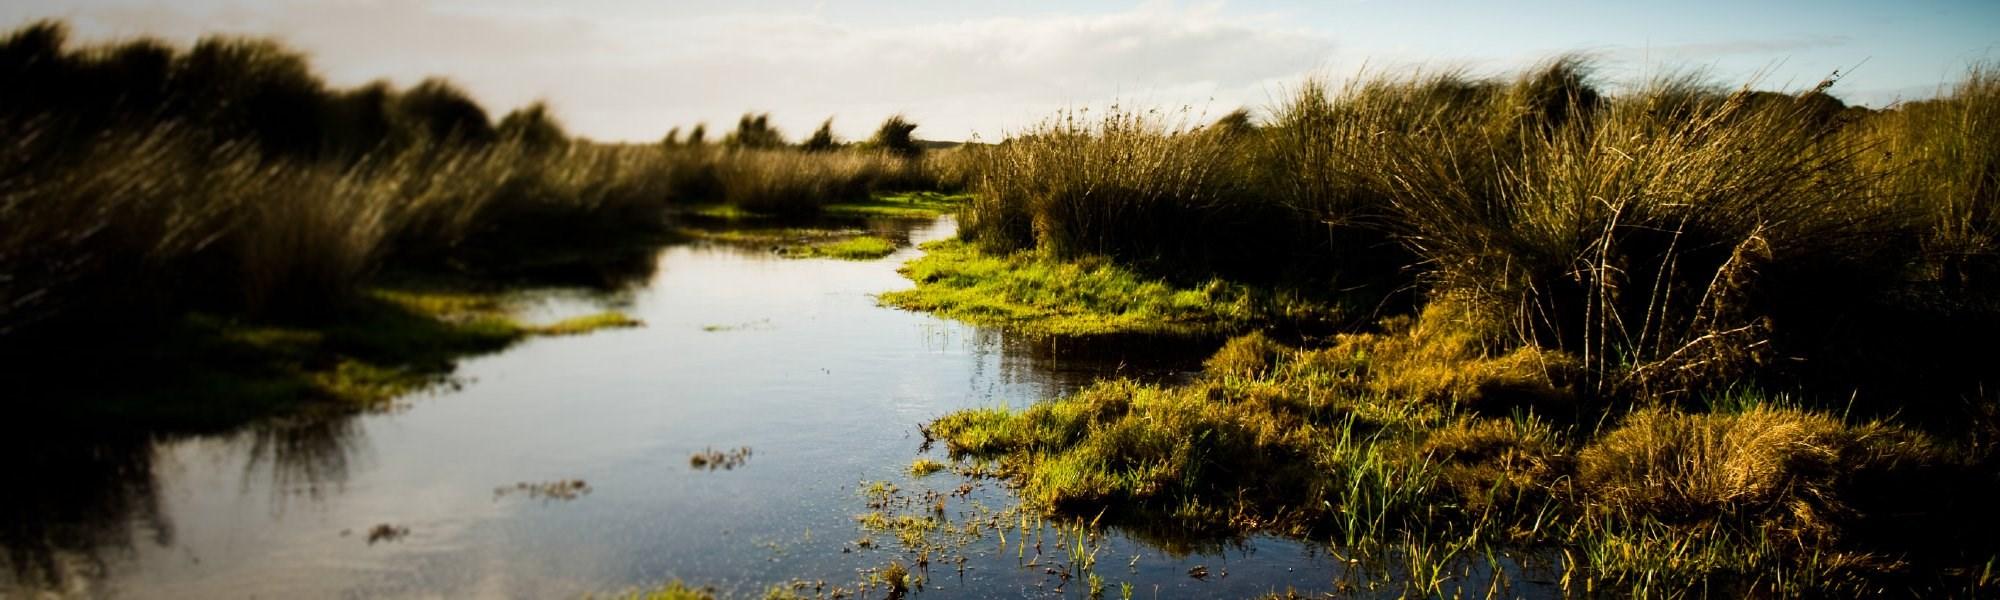 Certificate in wetland science management uw professional skip to main content xflitez Gallery